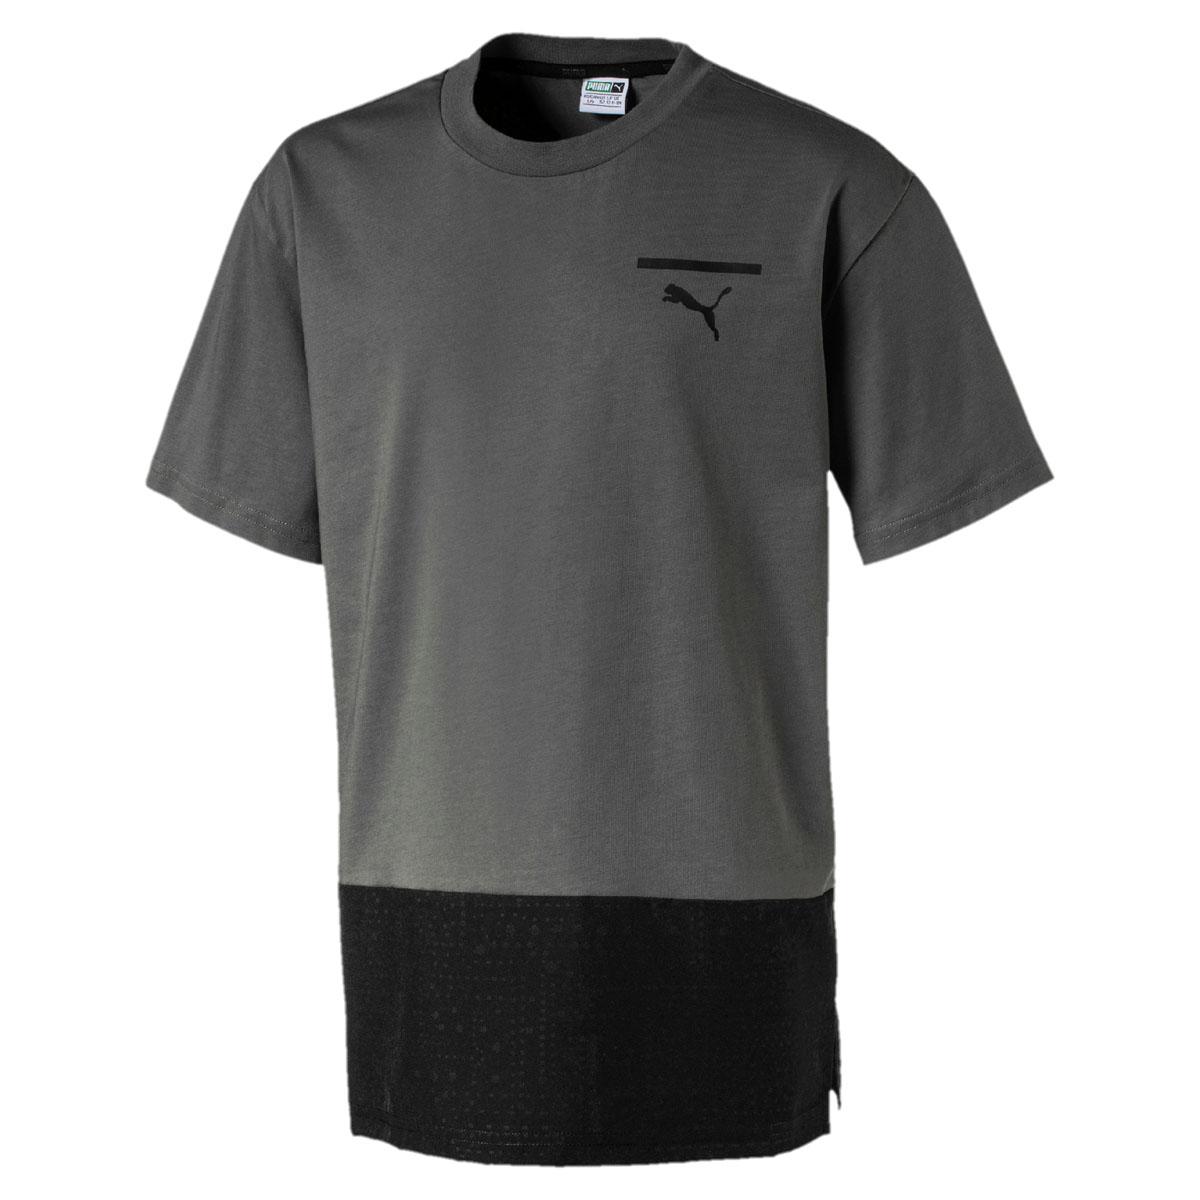 Футболка для мальчика Puma Pace Tee, цвет: серый, черный. 850245397. Размер 164 original new arrival 2018 puma pace primary fz hoody men s jacket sportswear